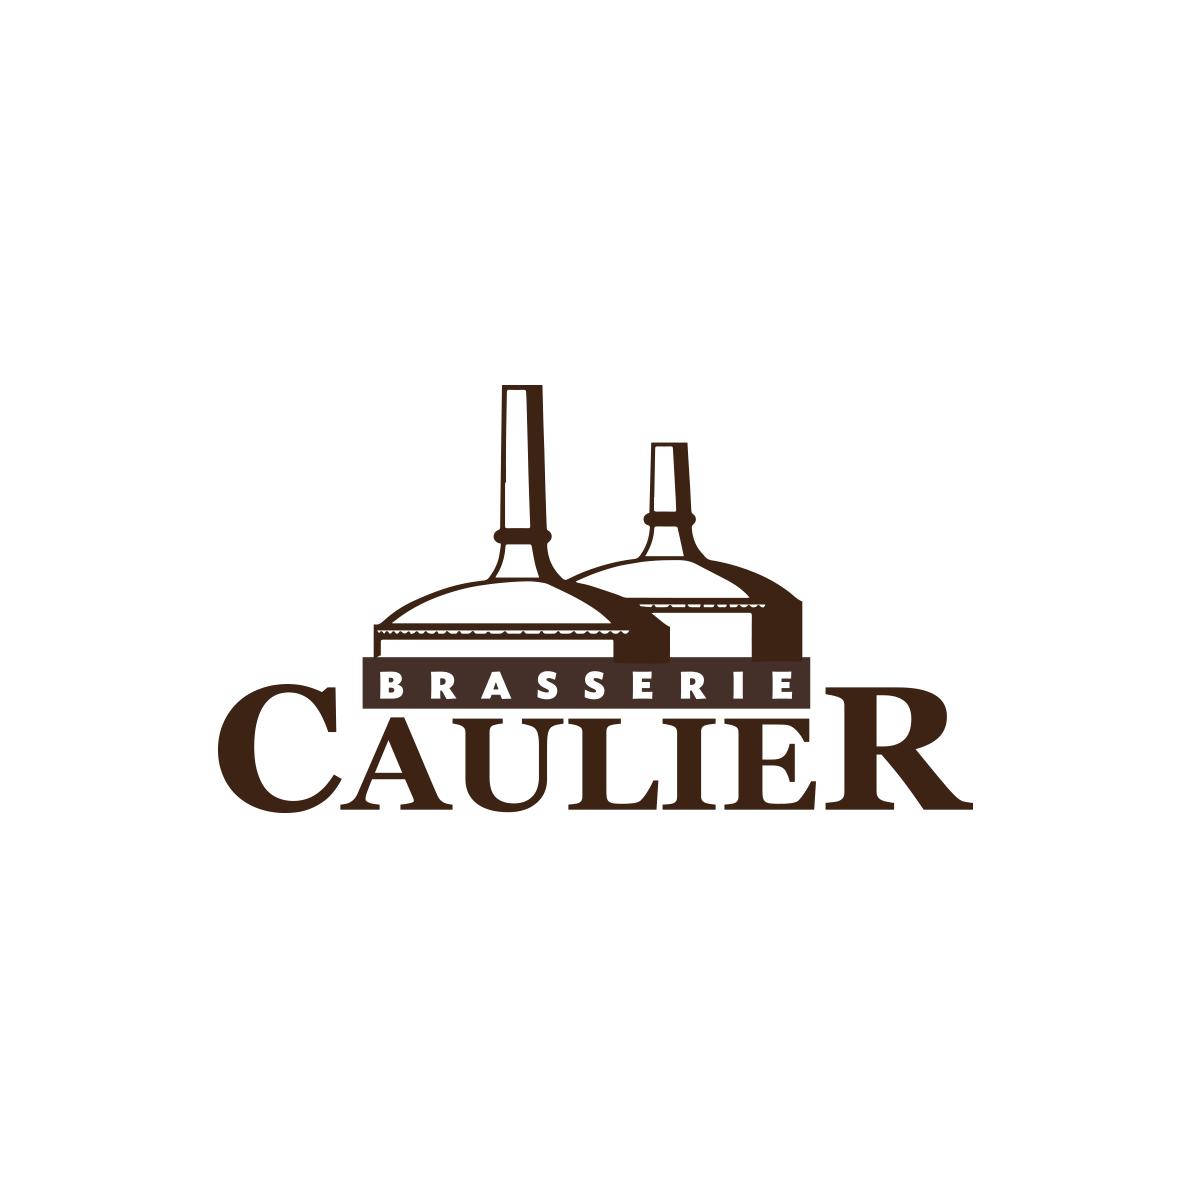 Caulier